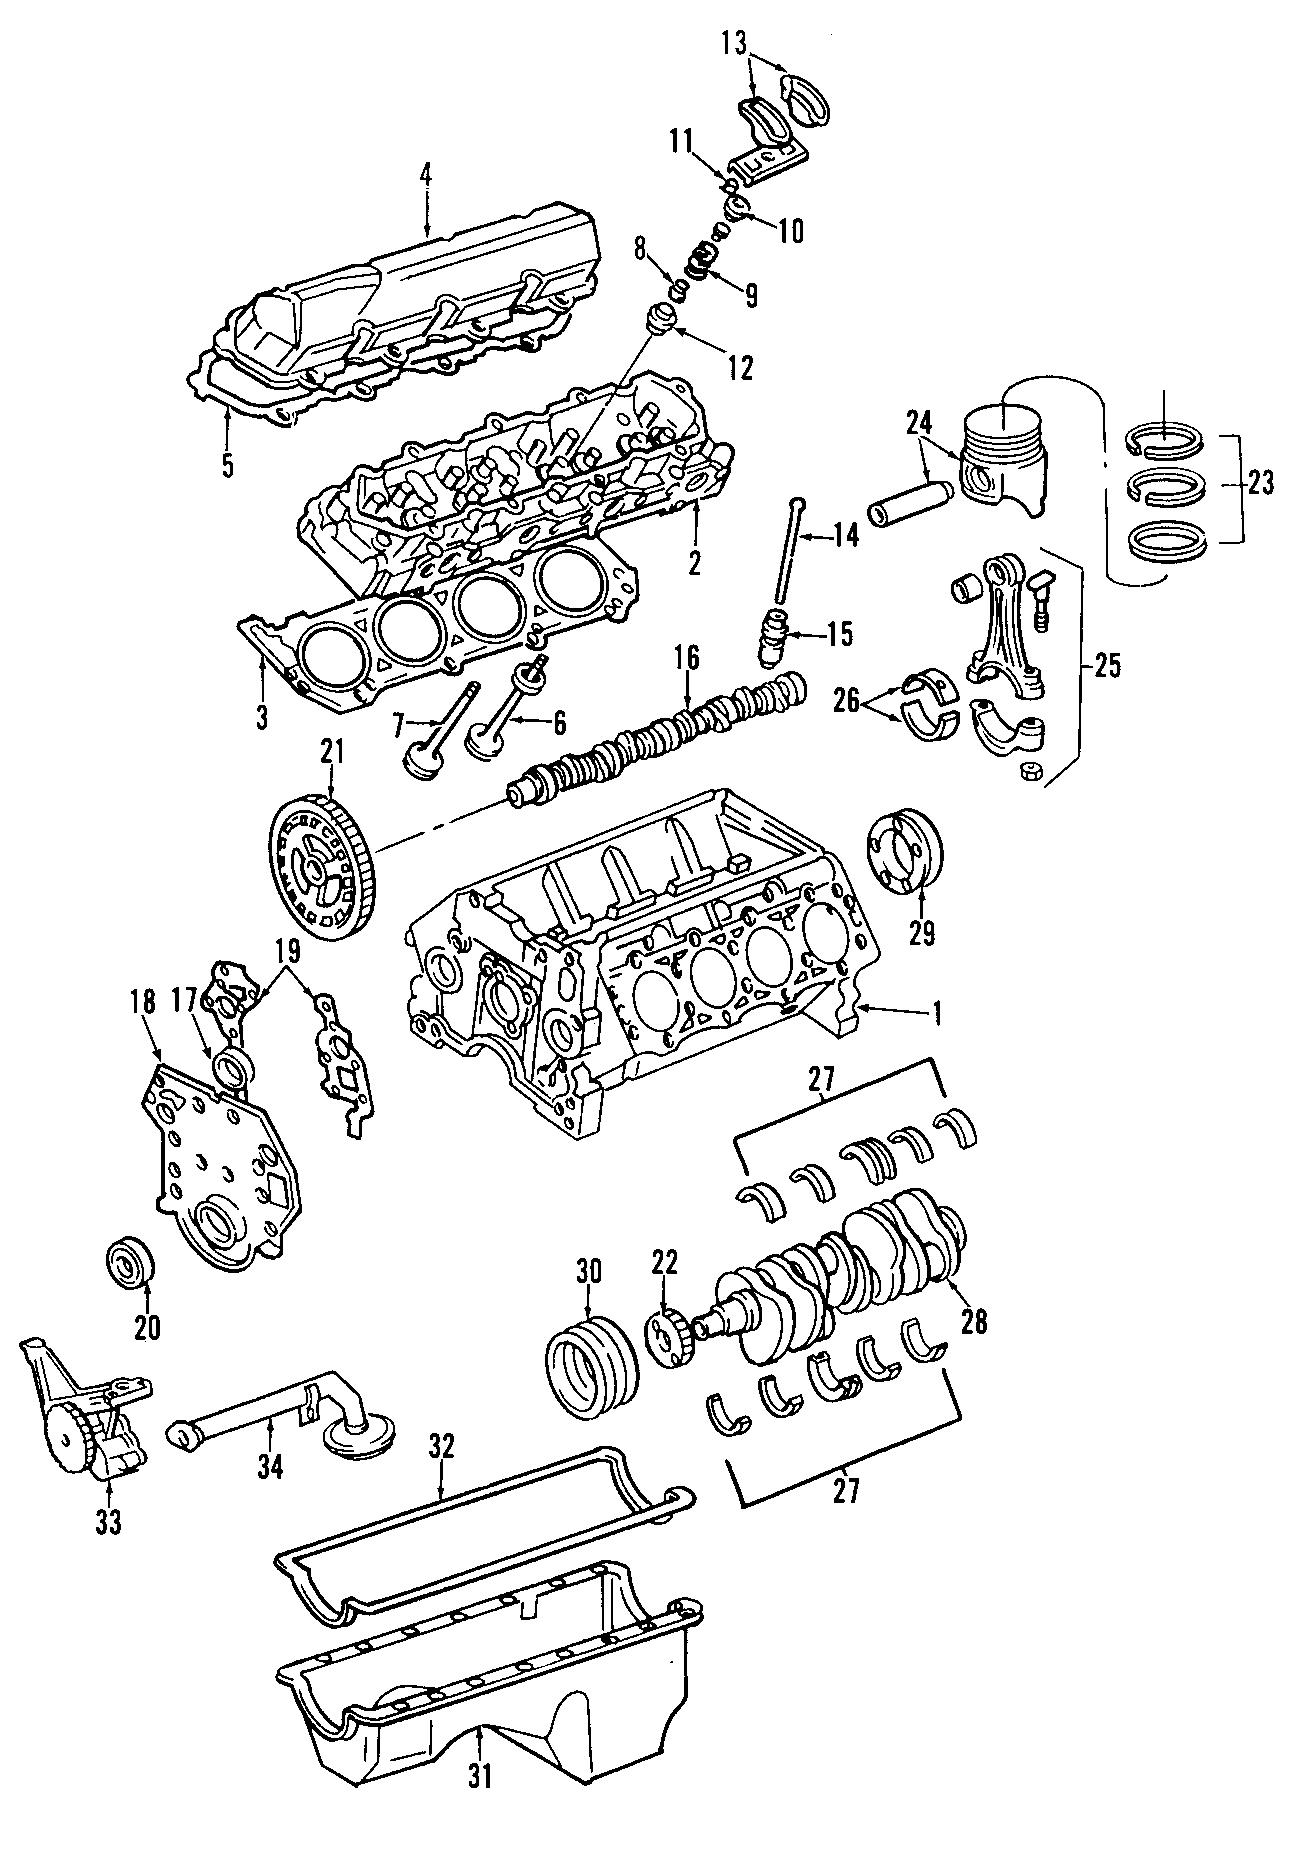 Ford F 350 Super Duty Engine Crankshaft Main Bearing